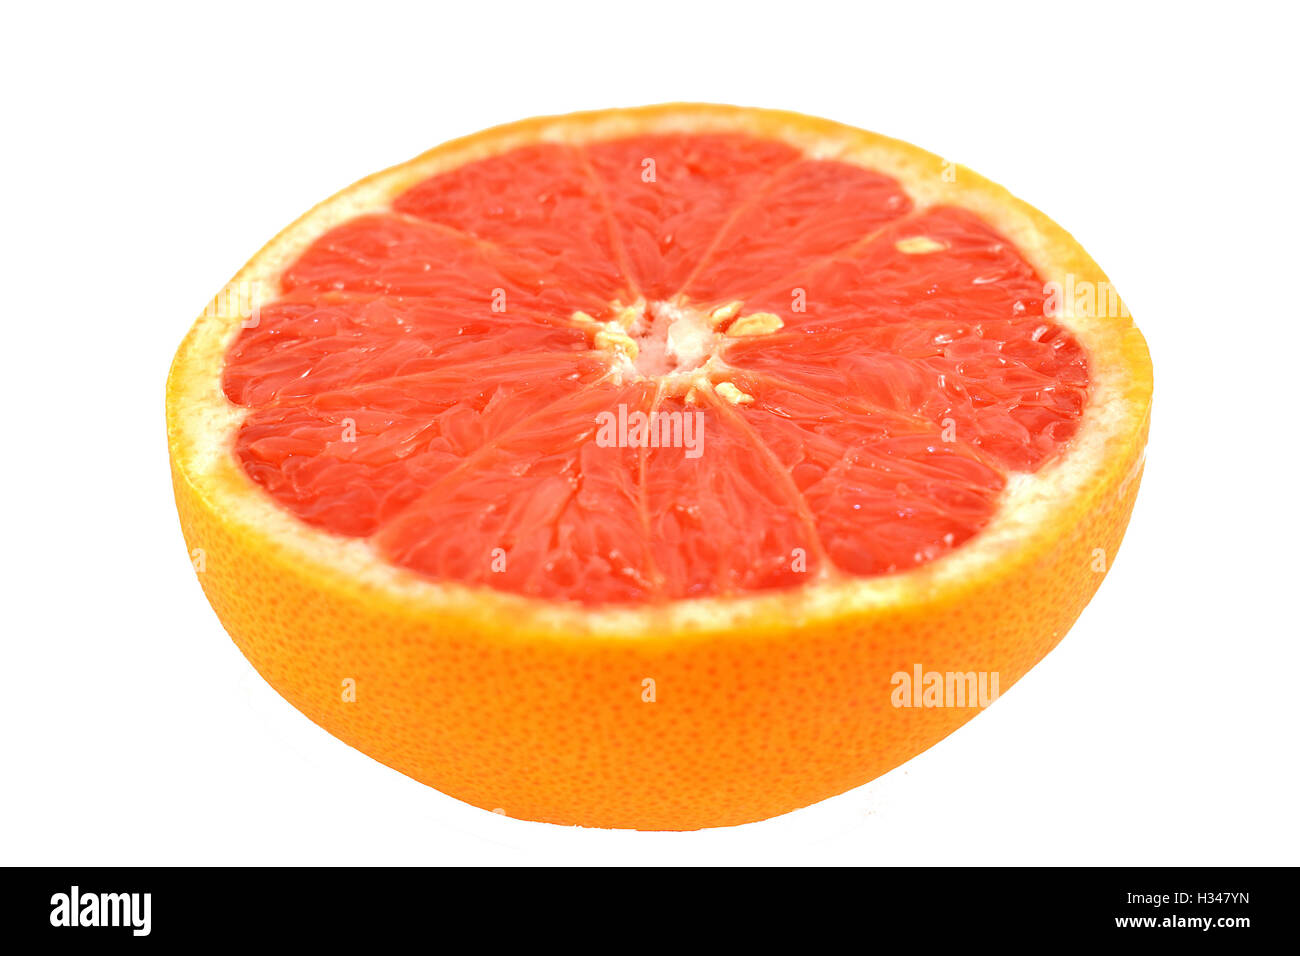 Half red grapefruit isolated on white background. - Stock Image